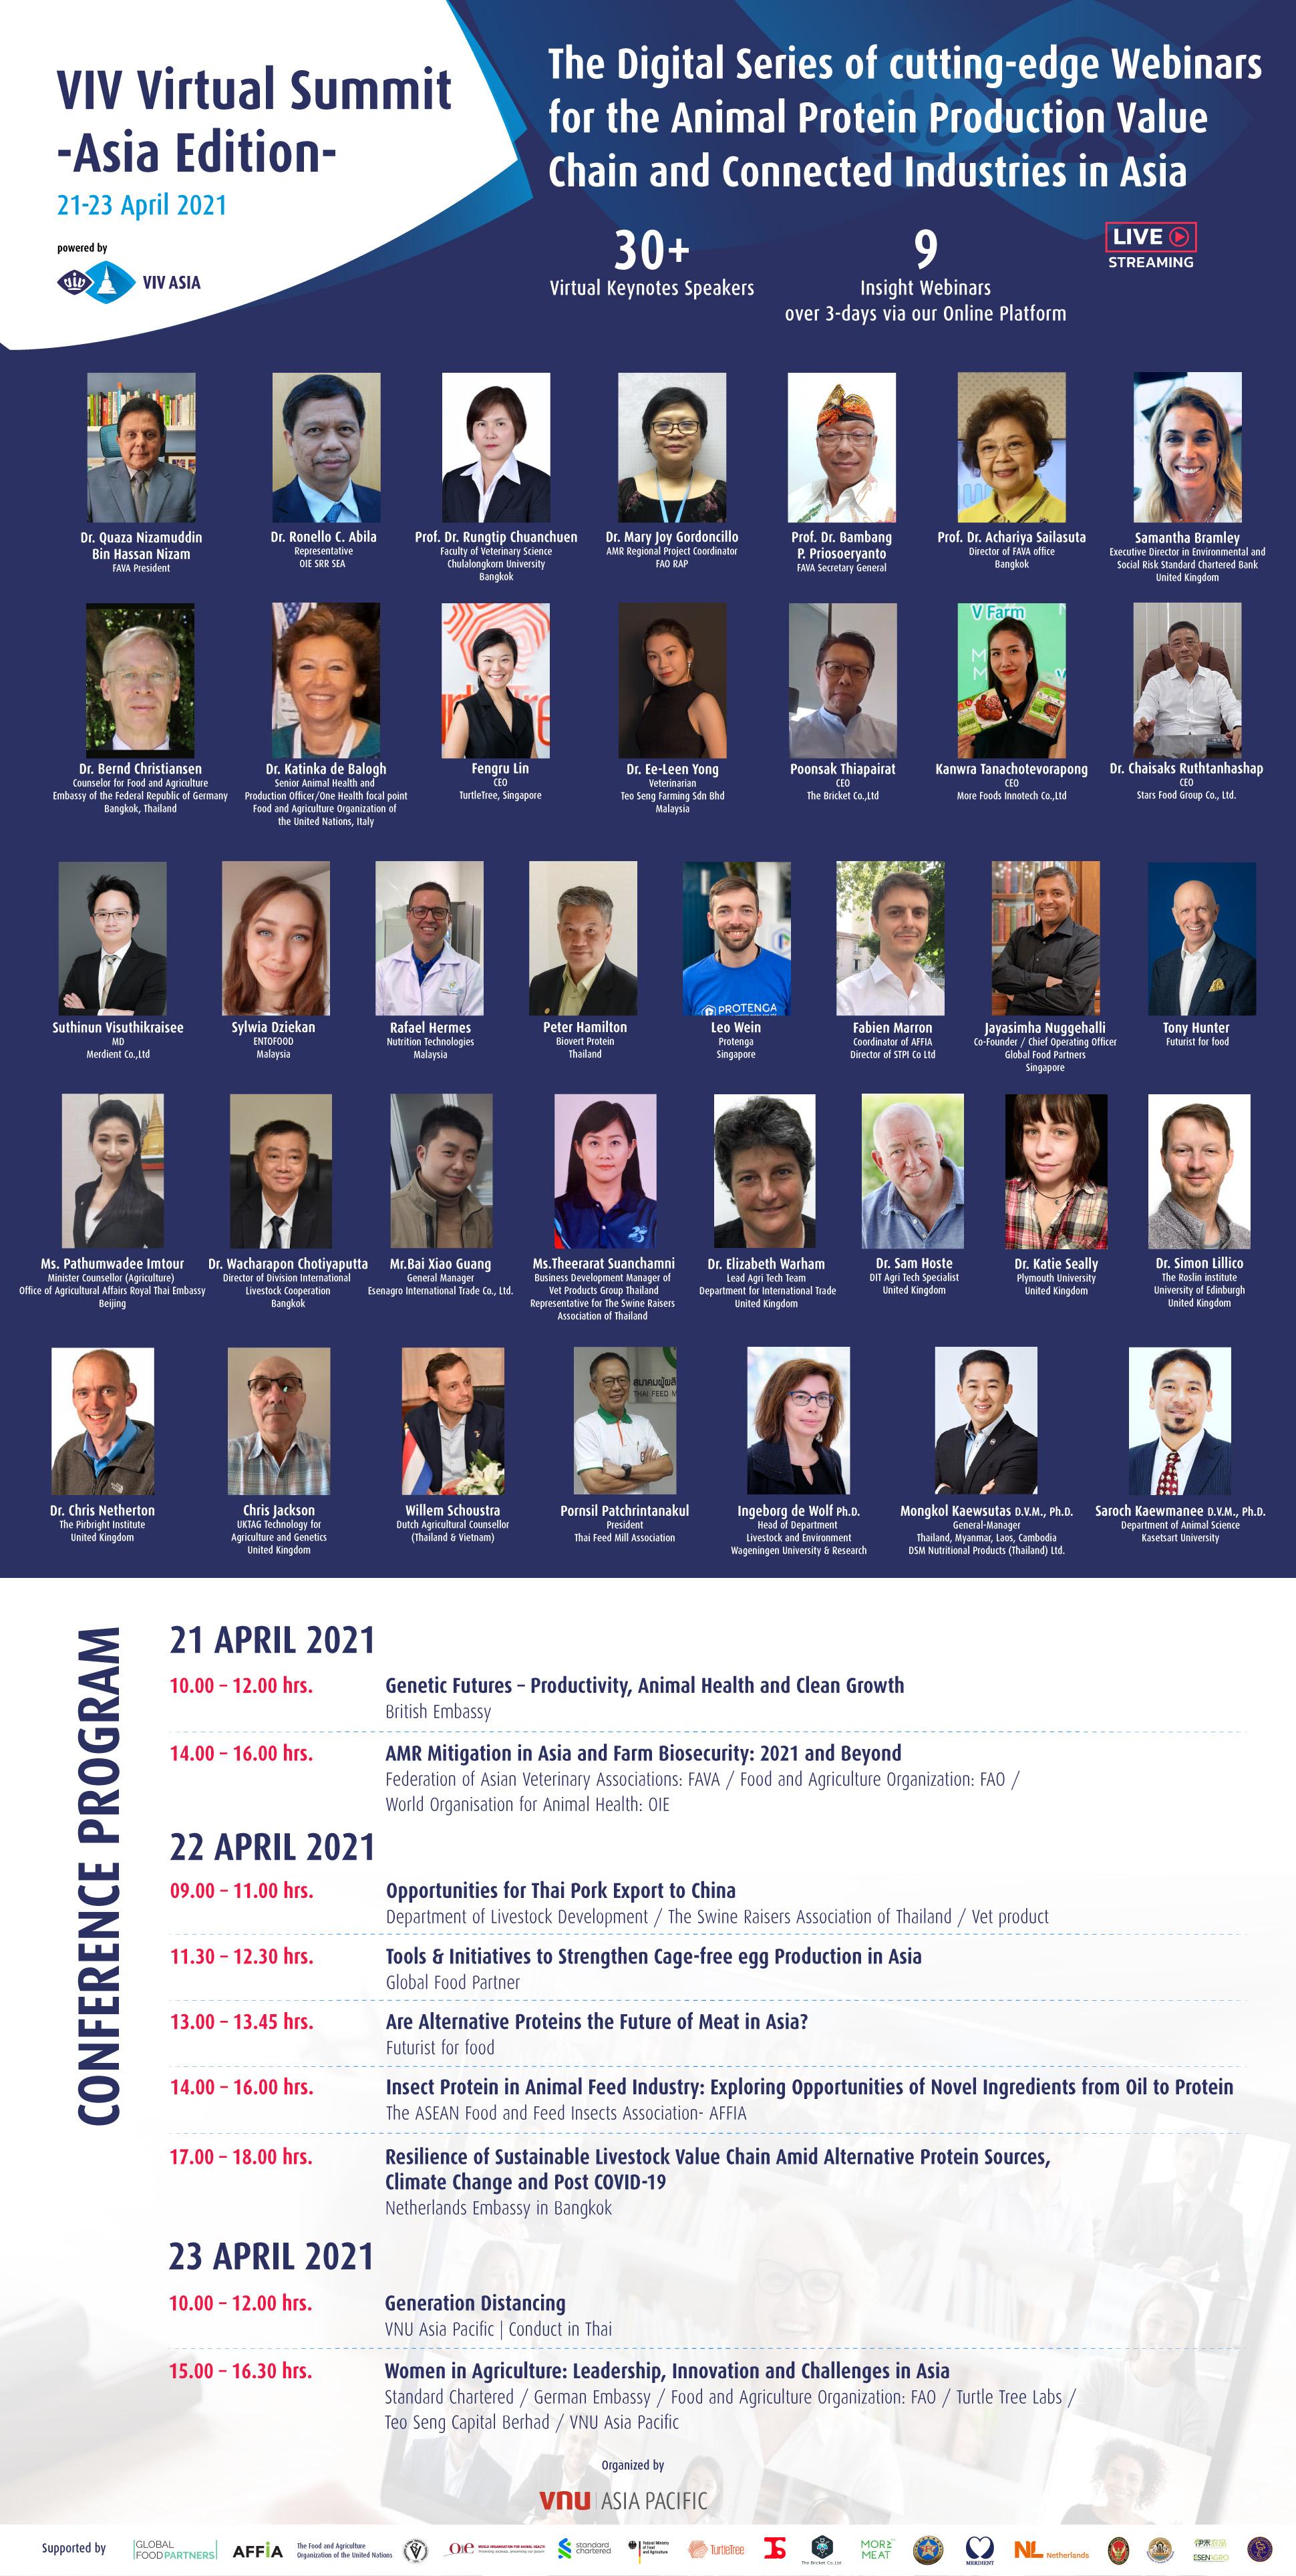 VIV Virtual Summit - Asia Edition - 21-23 เมษายน 2564